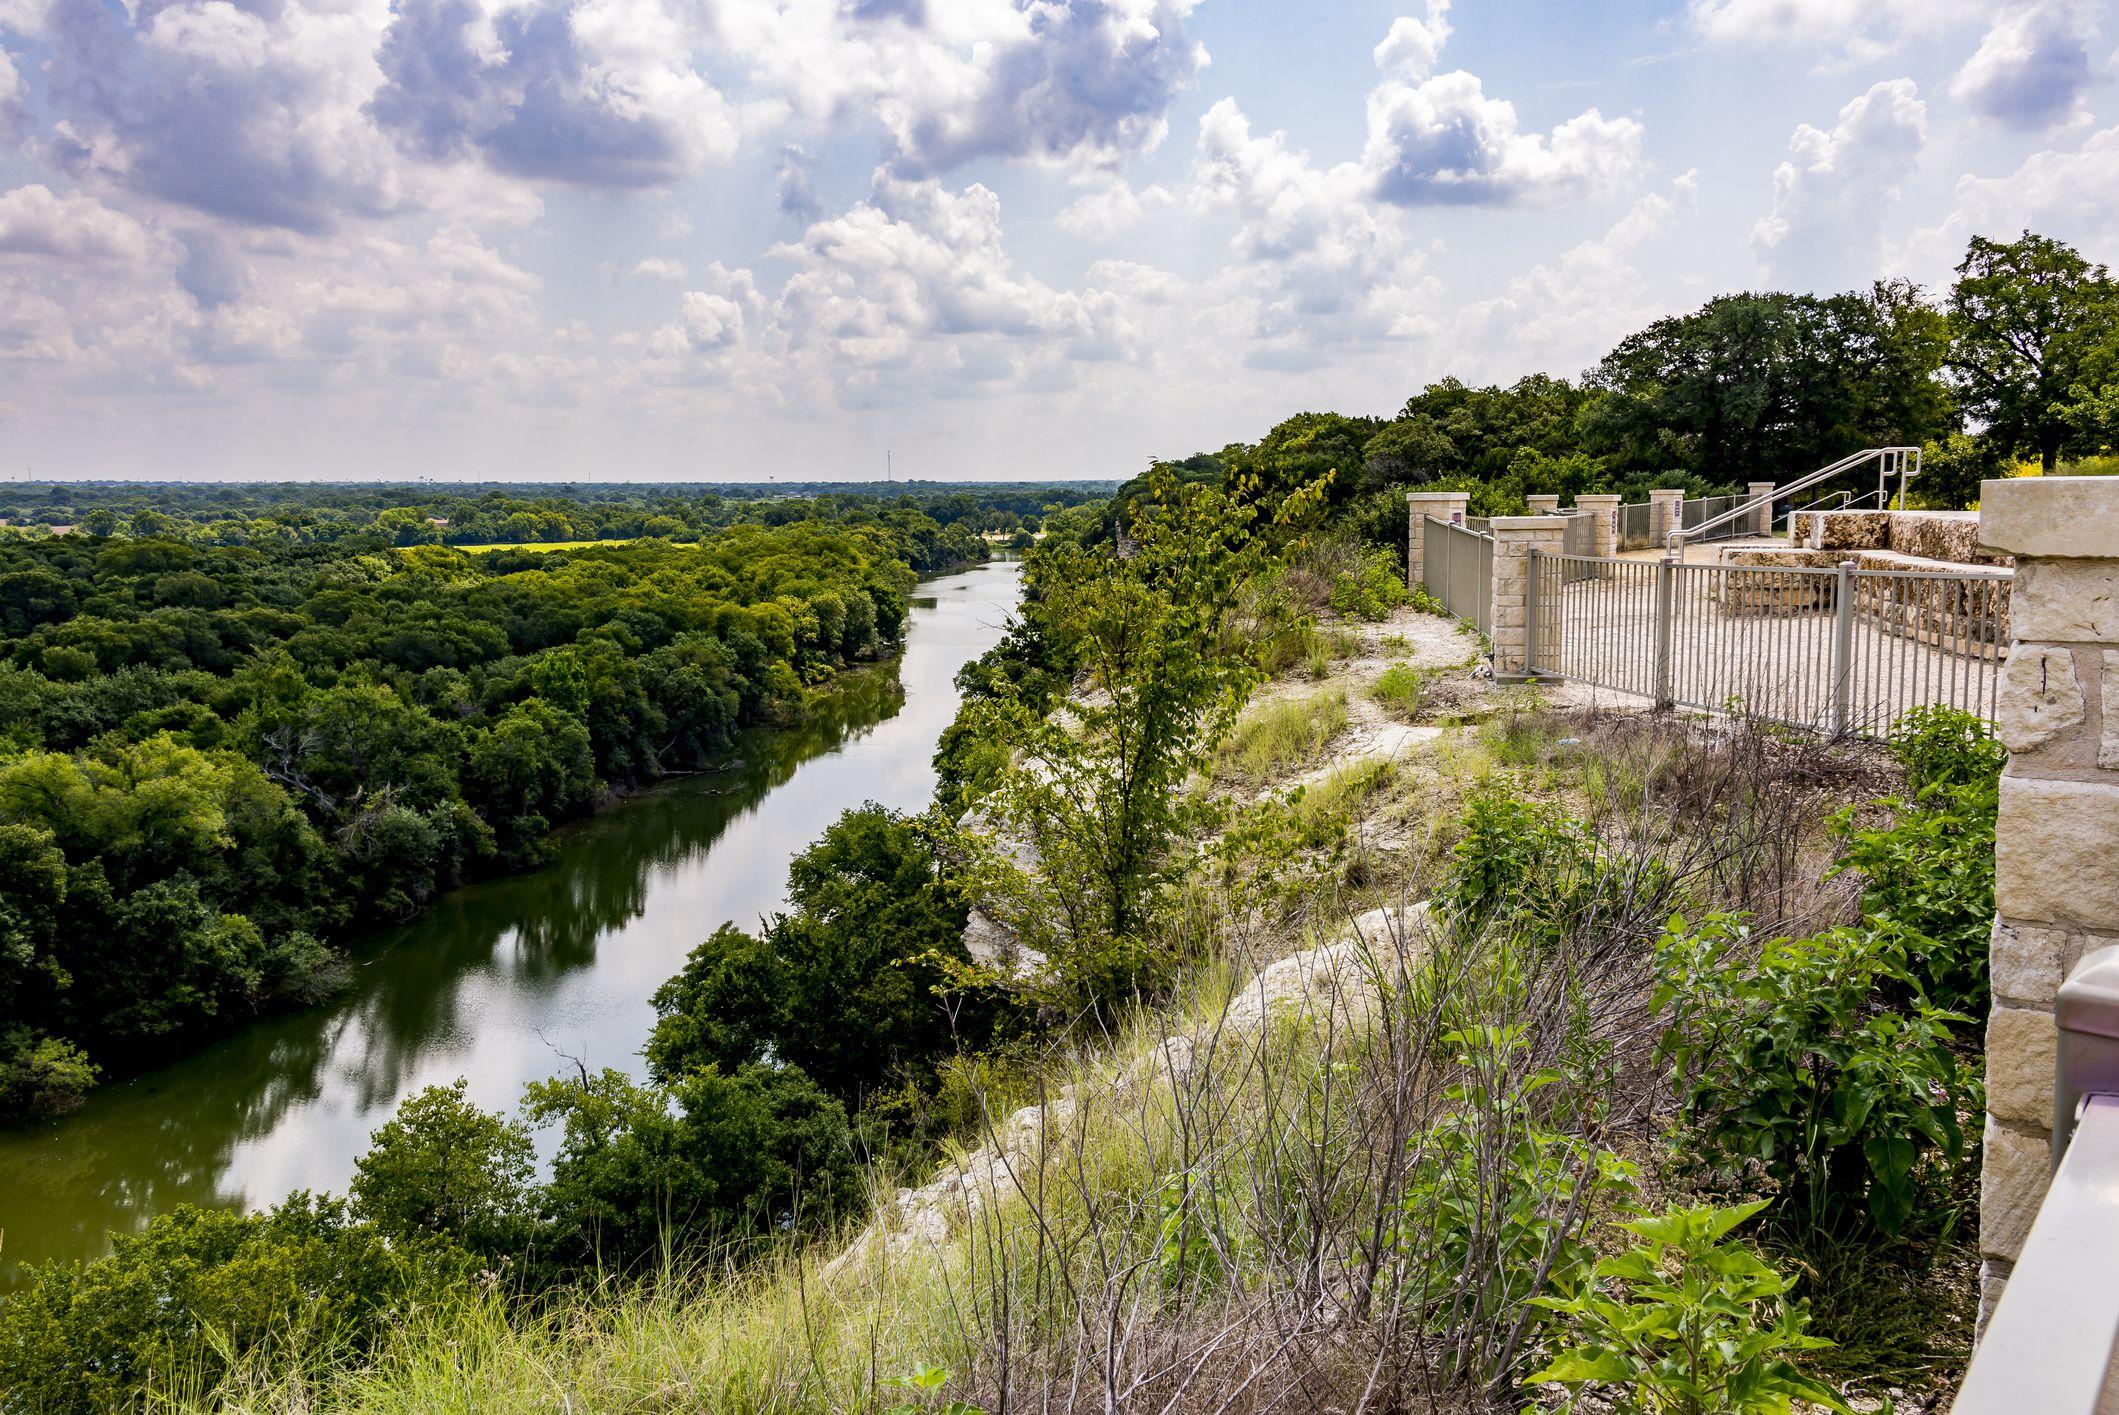 Royal Flush Water Slide & Jump   Waco, TX   YouTube